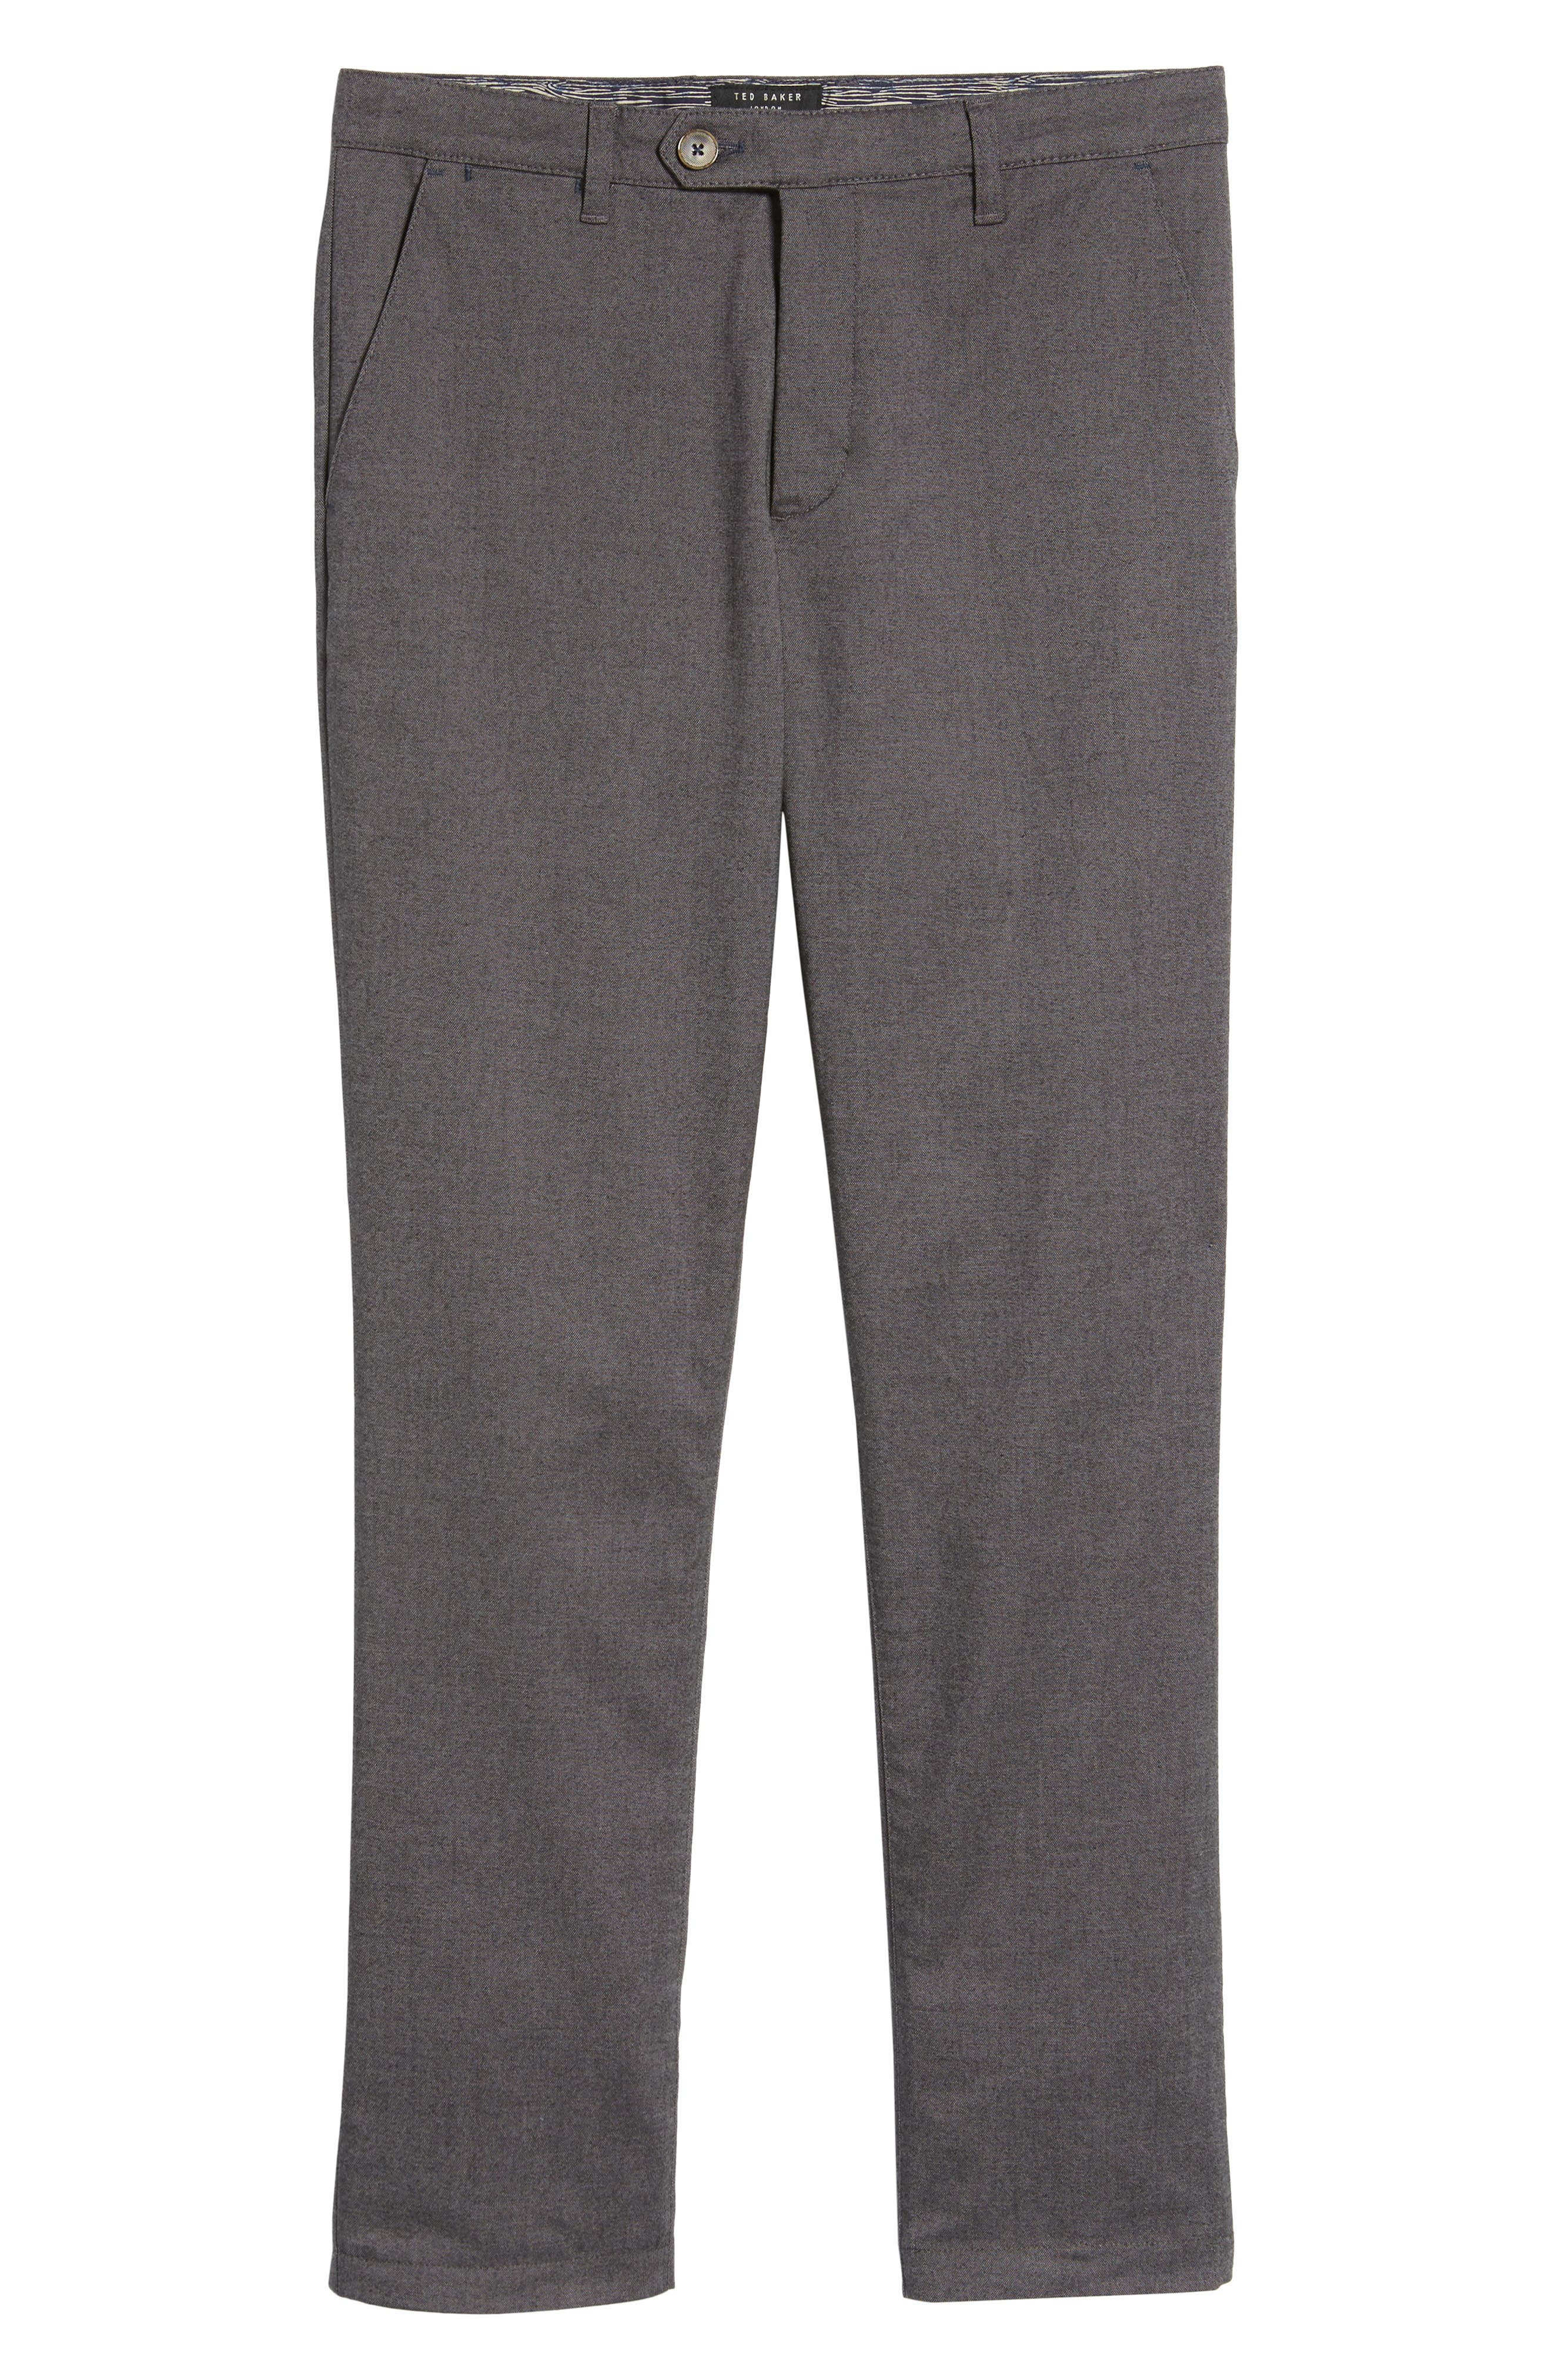 Modern Slim Fit Trousers,                             Alternate thumbnail 6, color,                             010